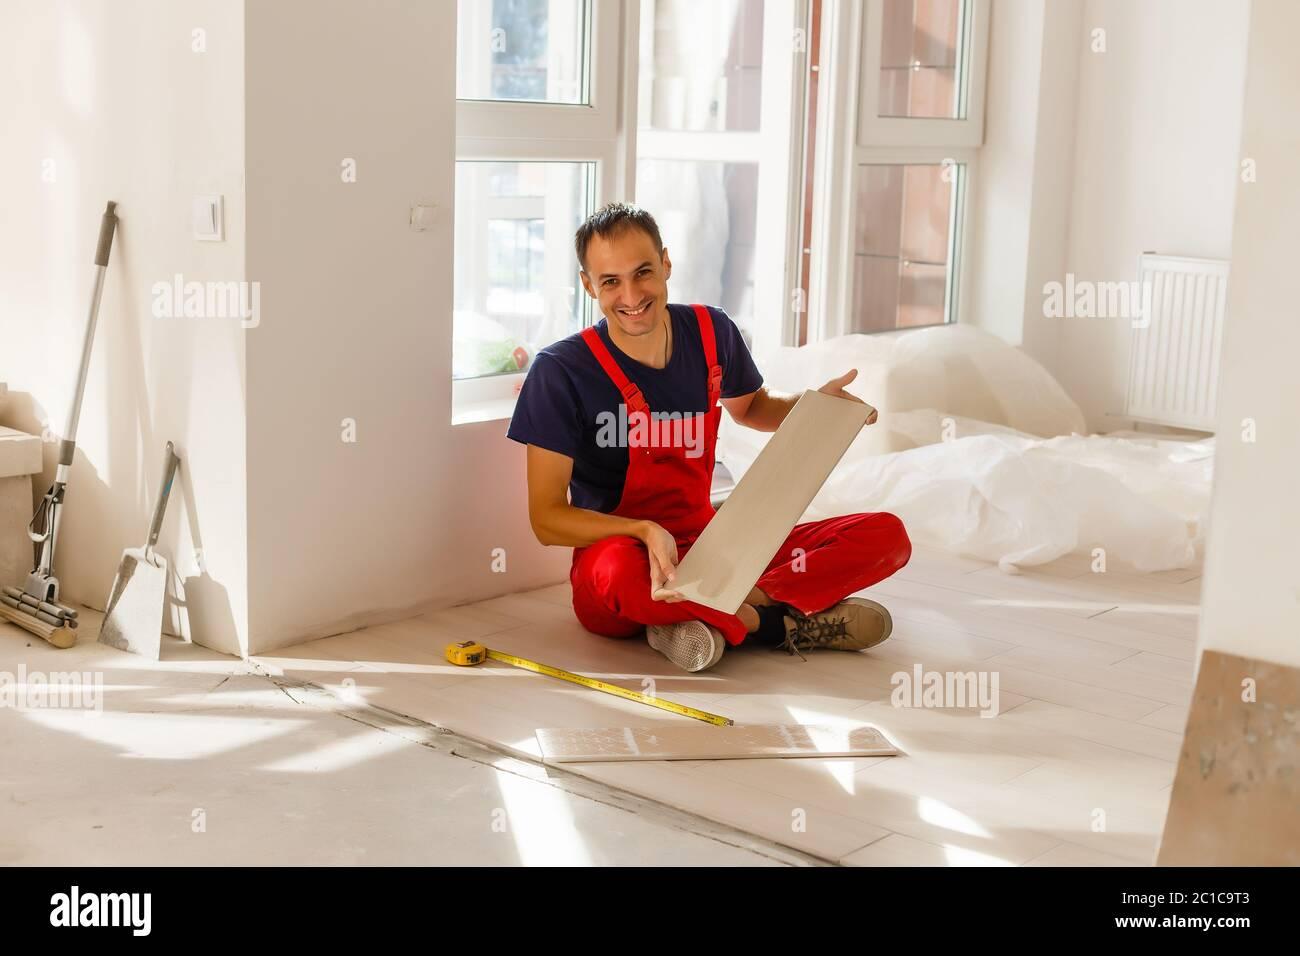 Industrial Tiler Builder Worker Installing Floor Tile At Repair Renovation Work Stock Photo Alamy